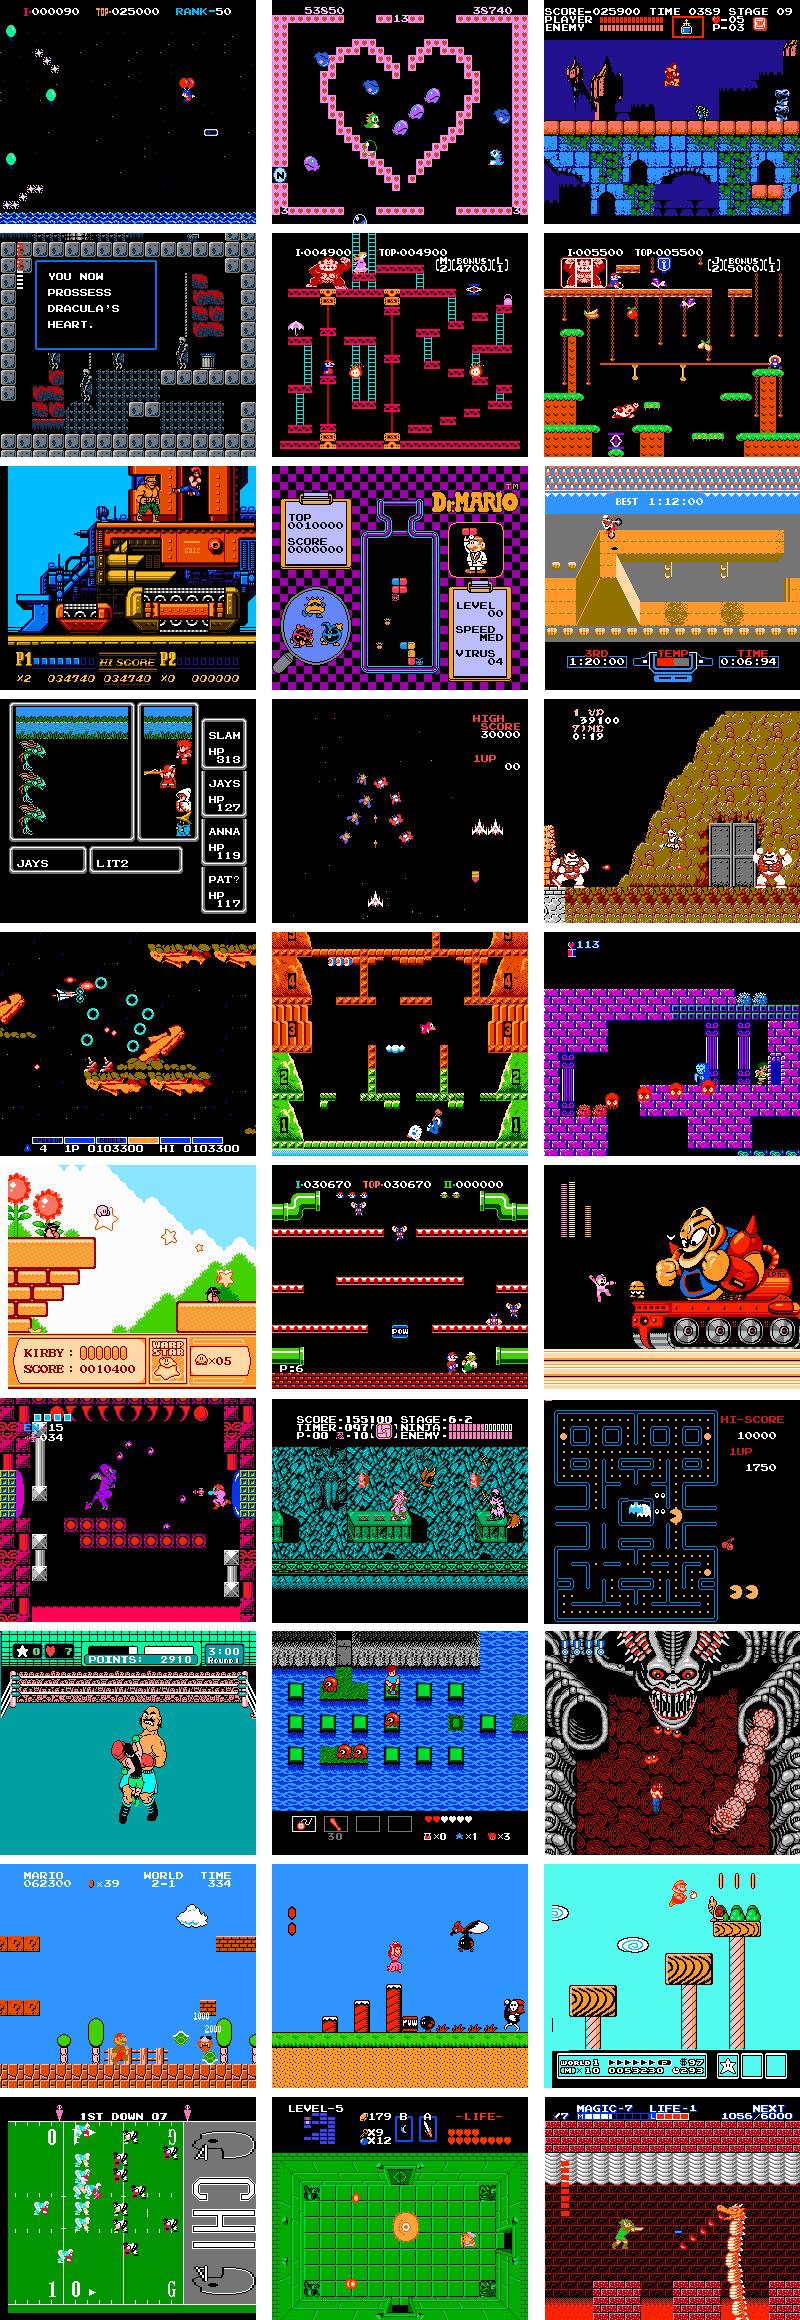 Nintendo Nes Classic Mini La Guia Definitiva Faqs Y Donde Comprarla